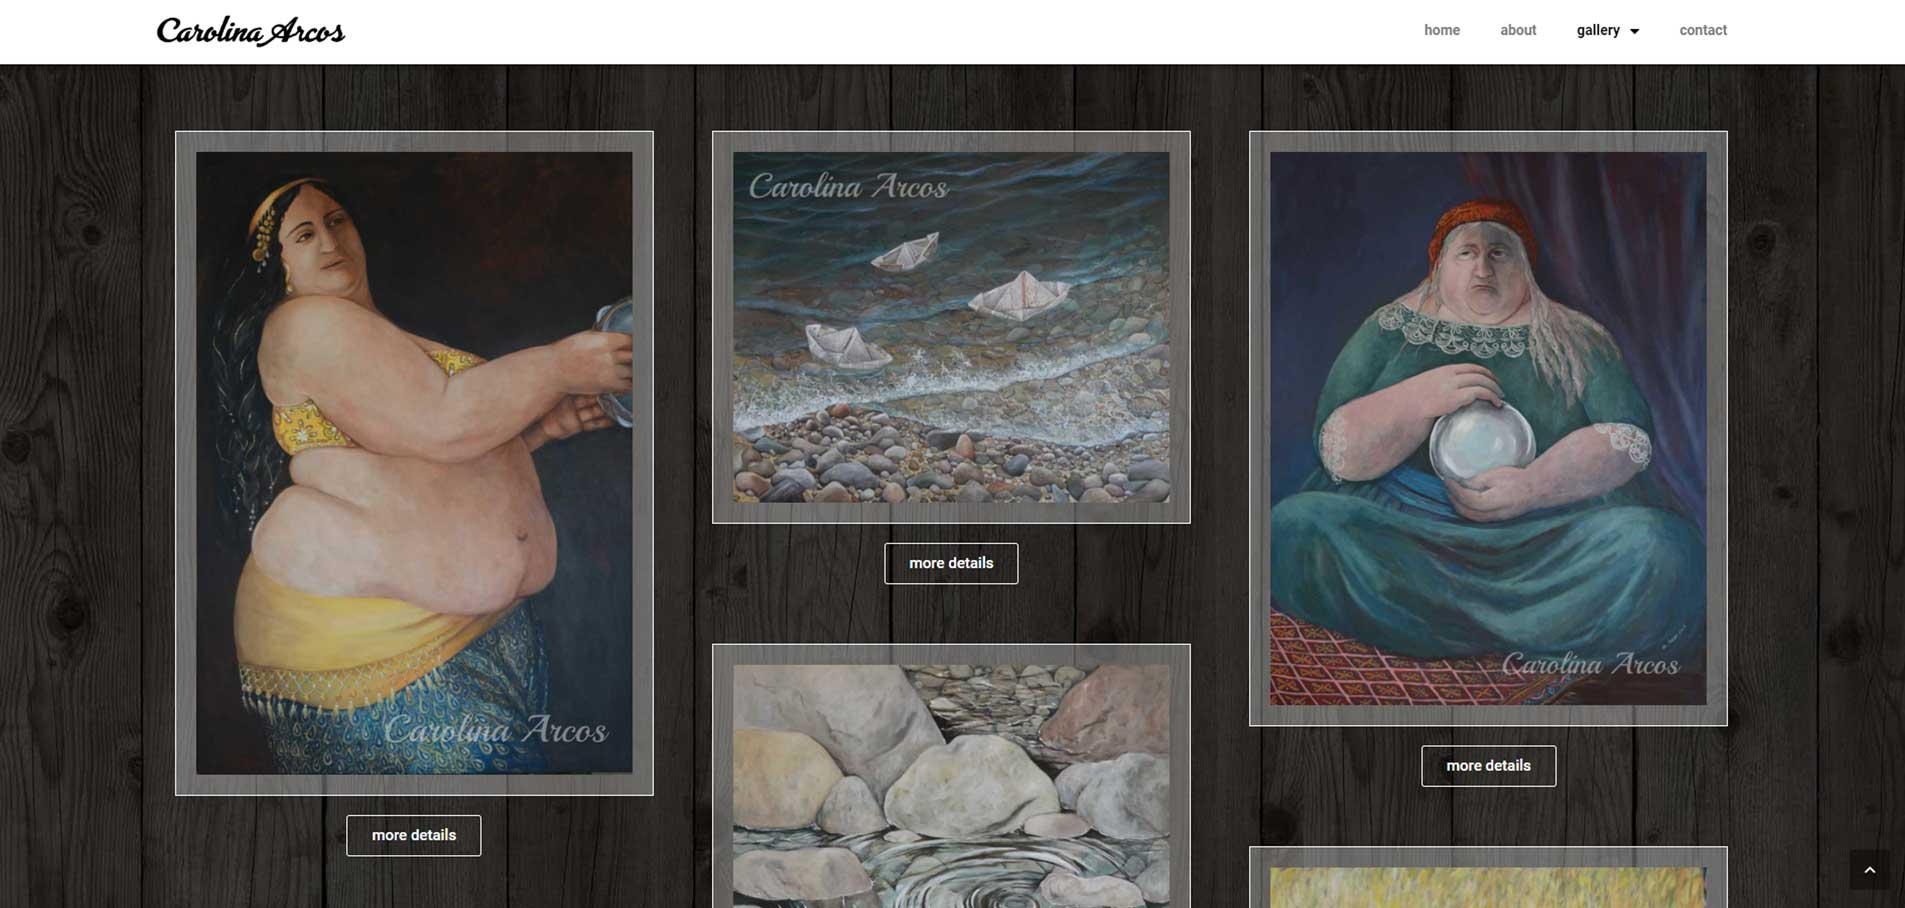 Carolina Arcos gallery page in website